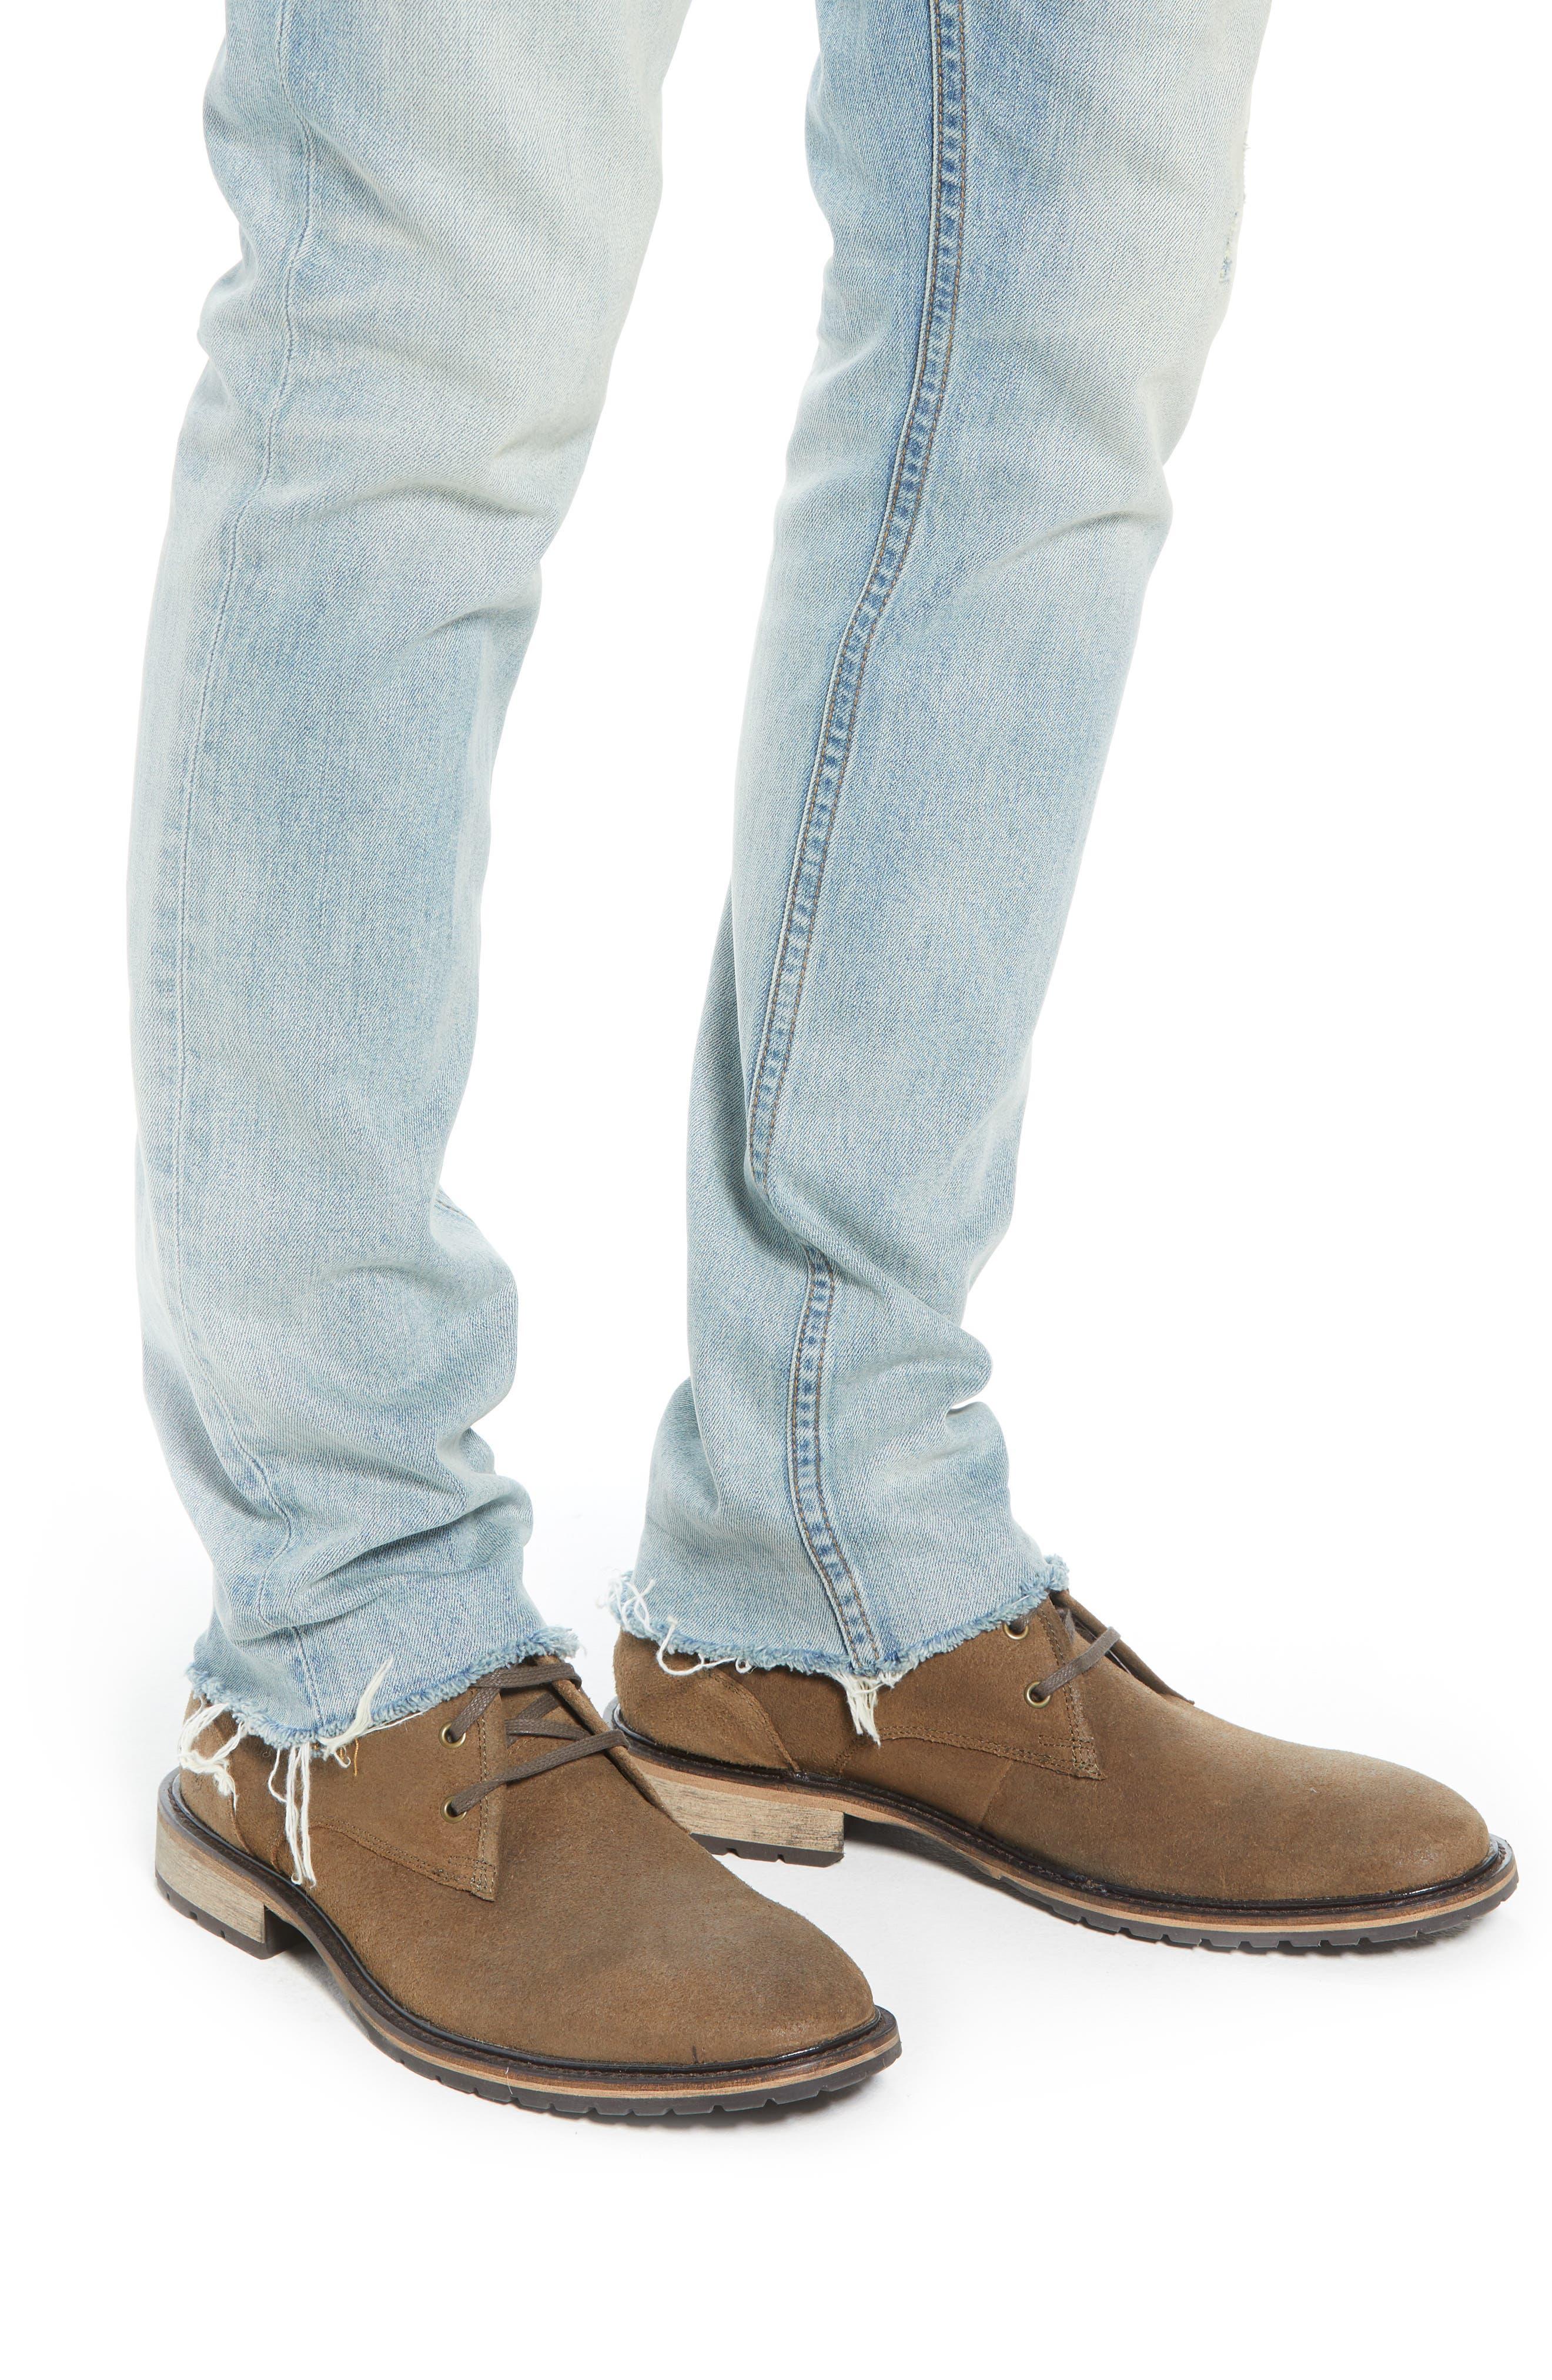 Slim Fit Jeans,                             Alternate thumbnail 4, color,                             BLUE FADED LIGHT WASH